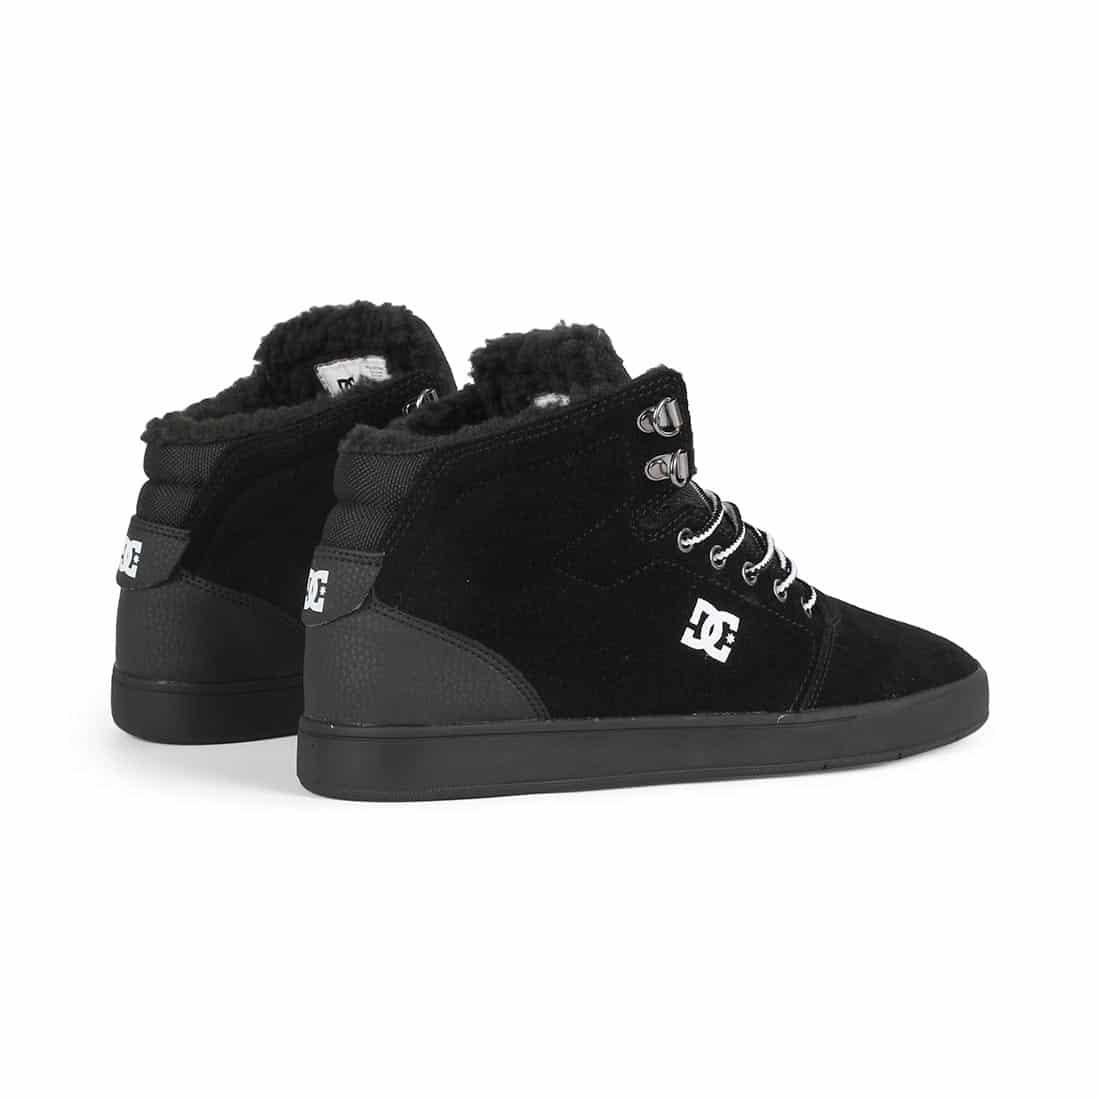 DC Shoes Crisis High WNT - Black / White / Black